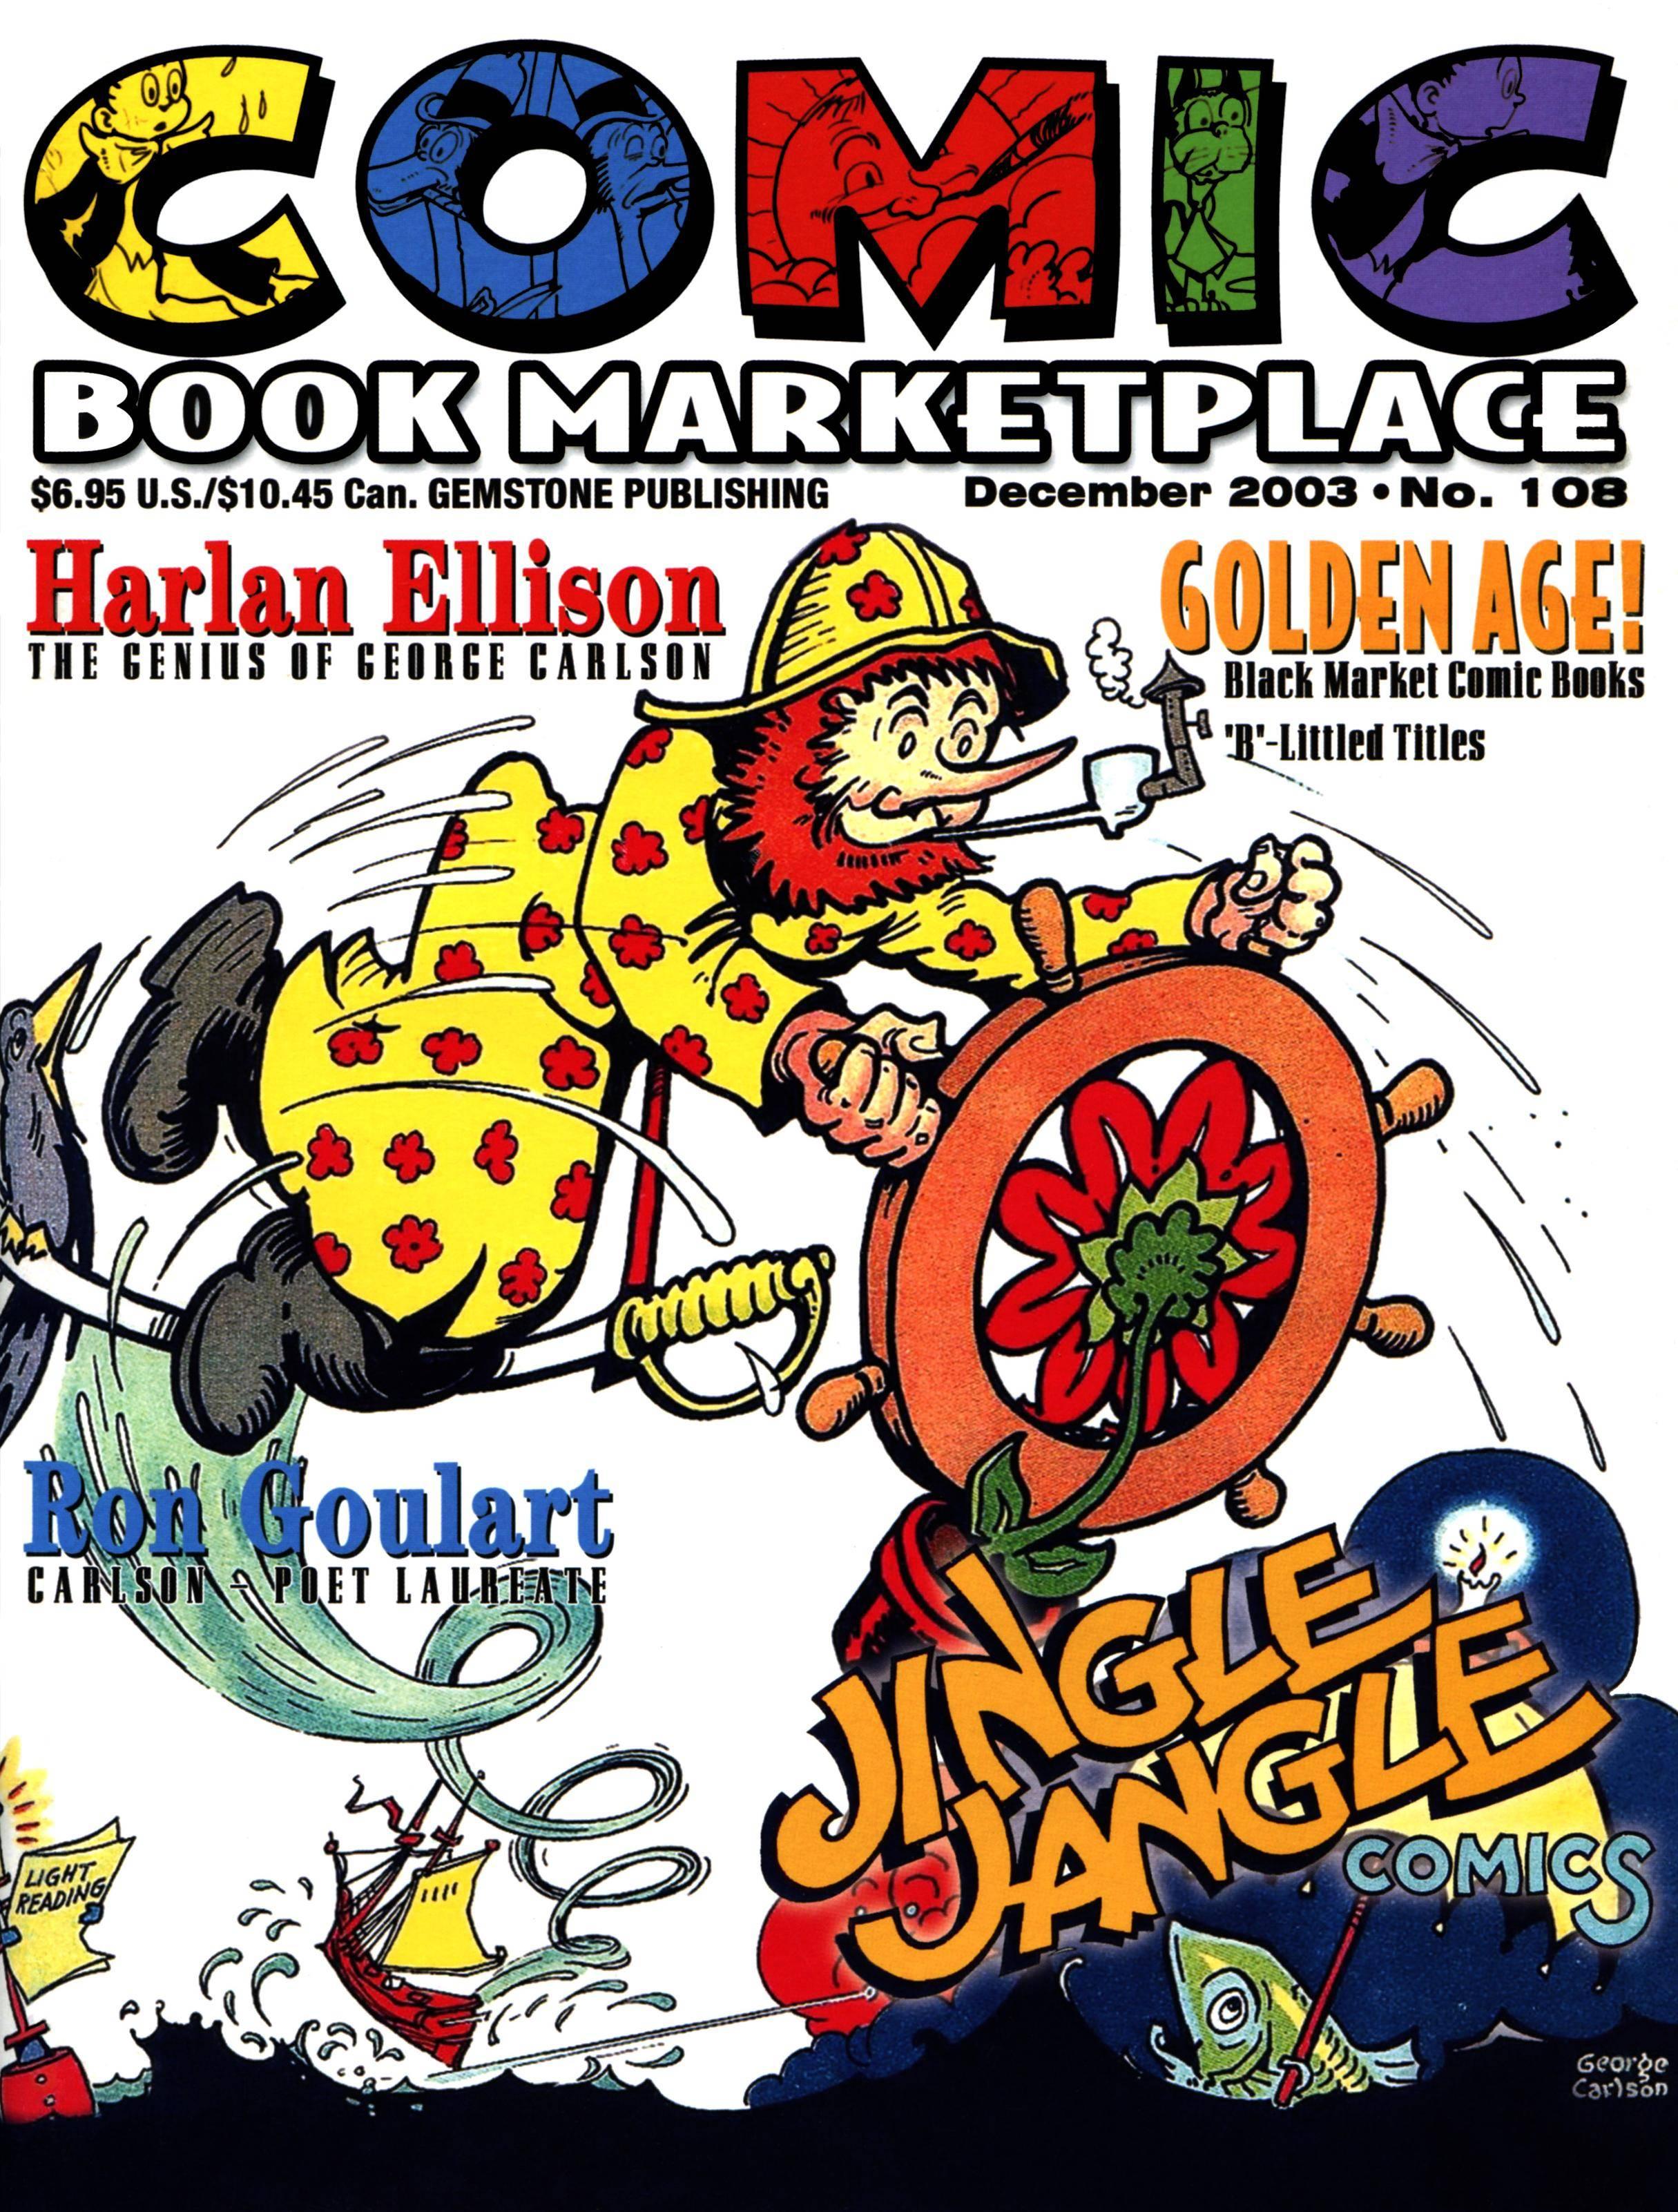 Comic Book Marketplace 108 2003